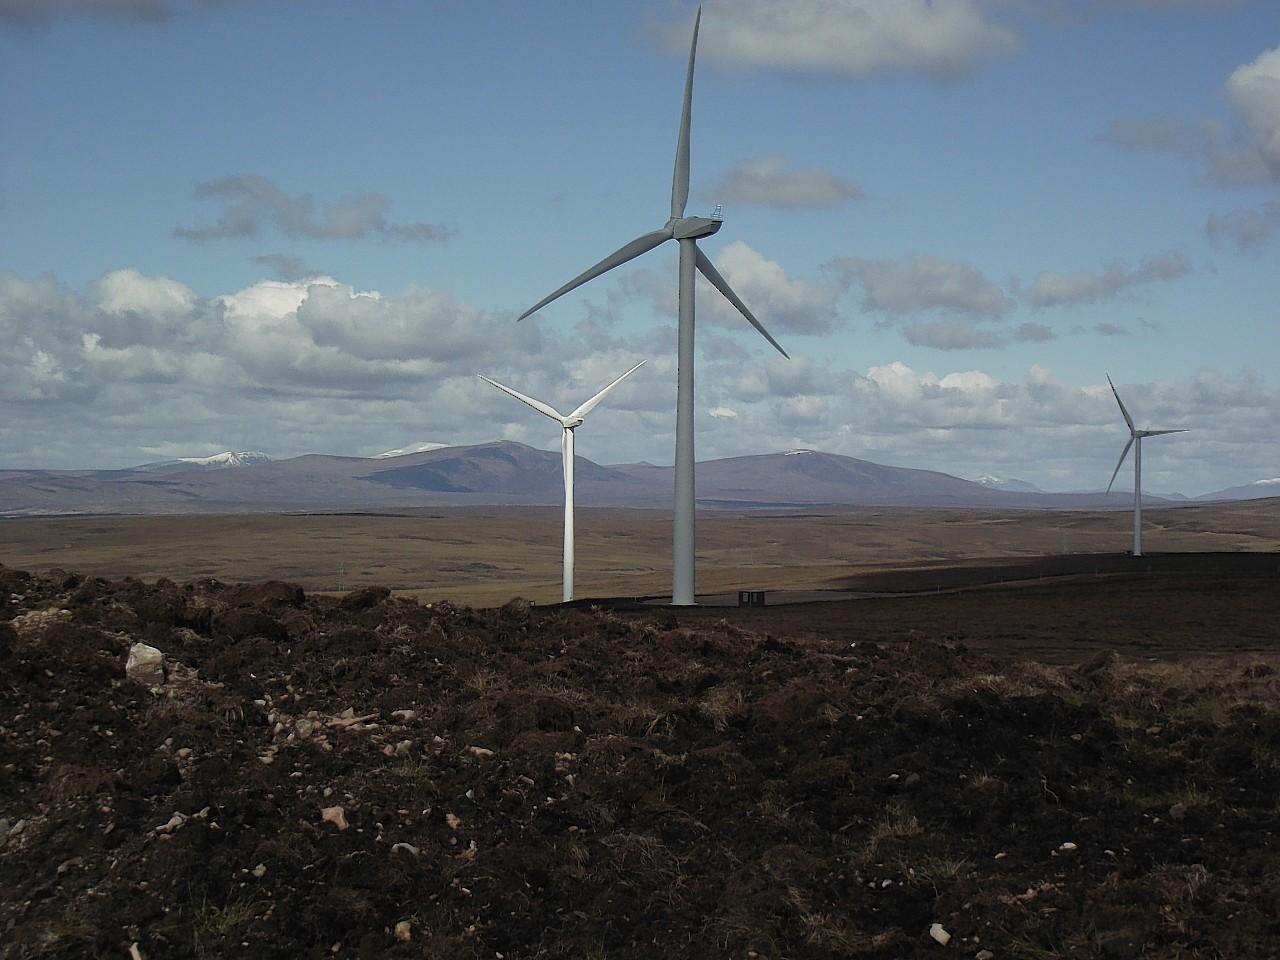 Gordonbush Windfarm, near the proposed Kintradwell site